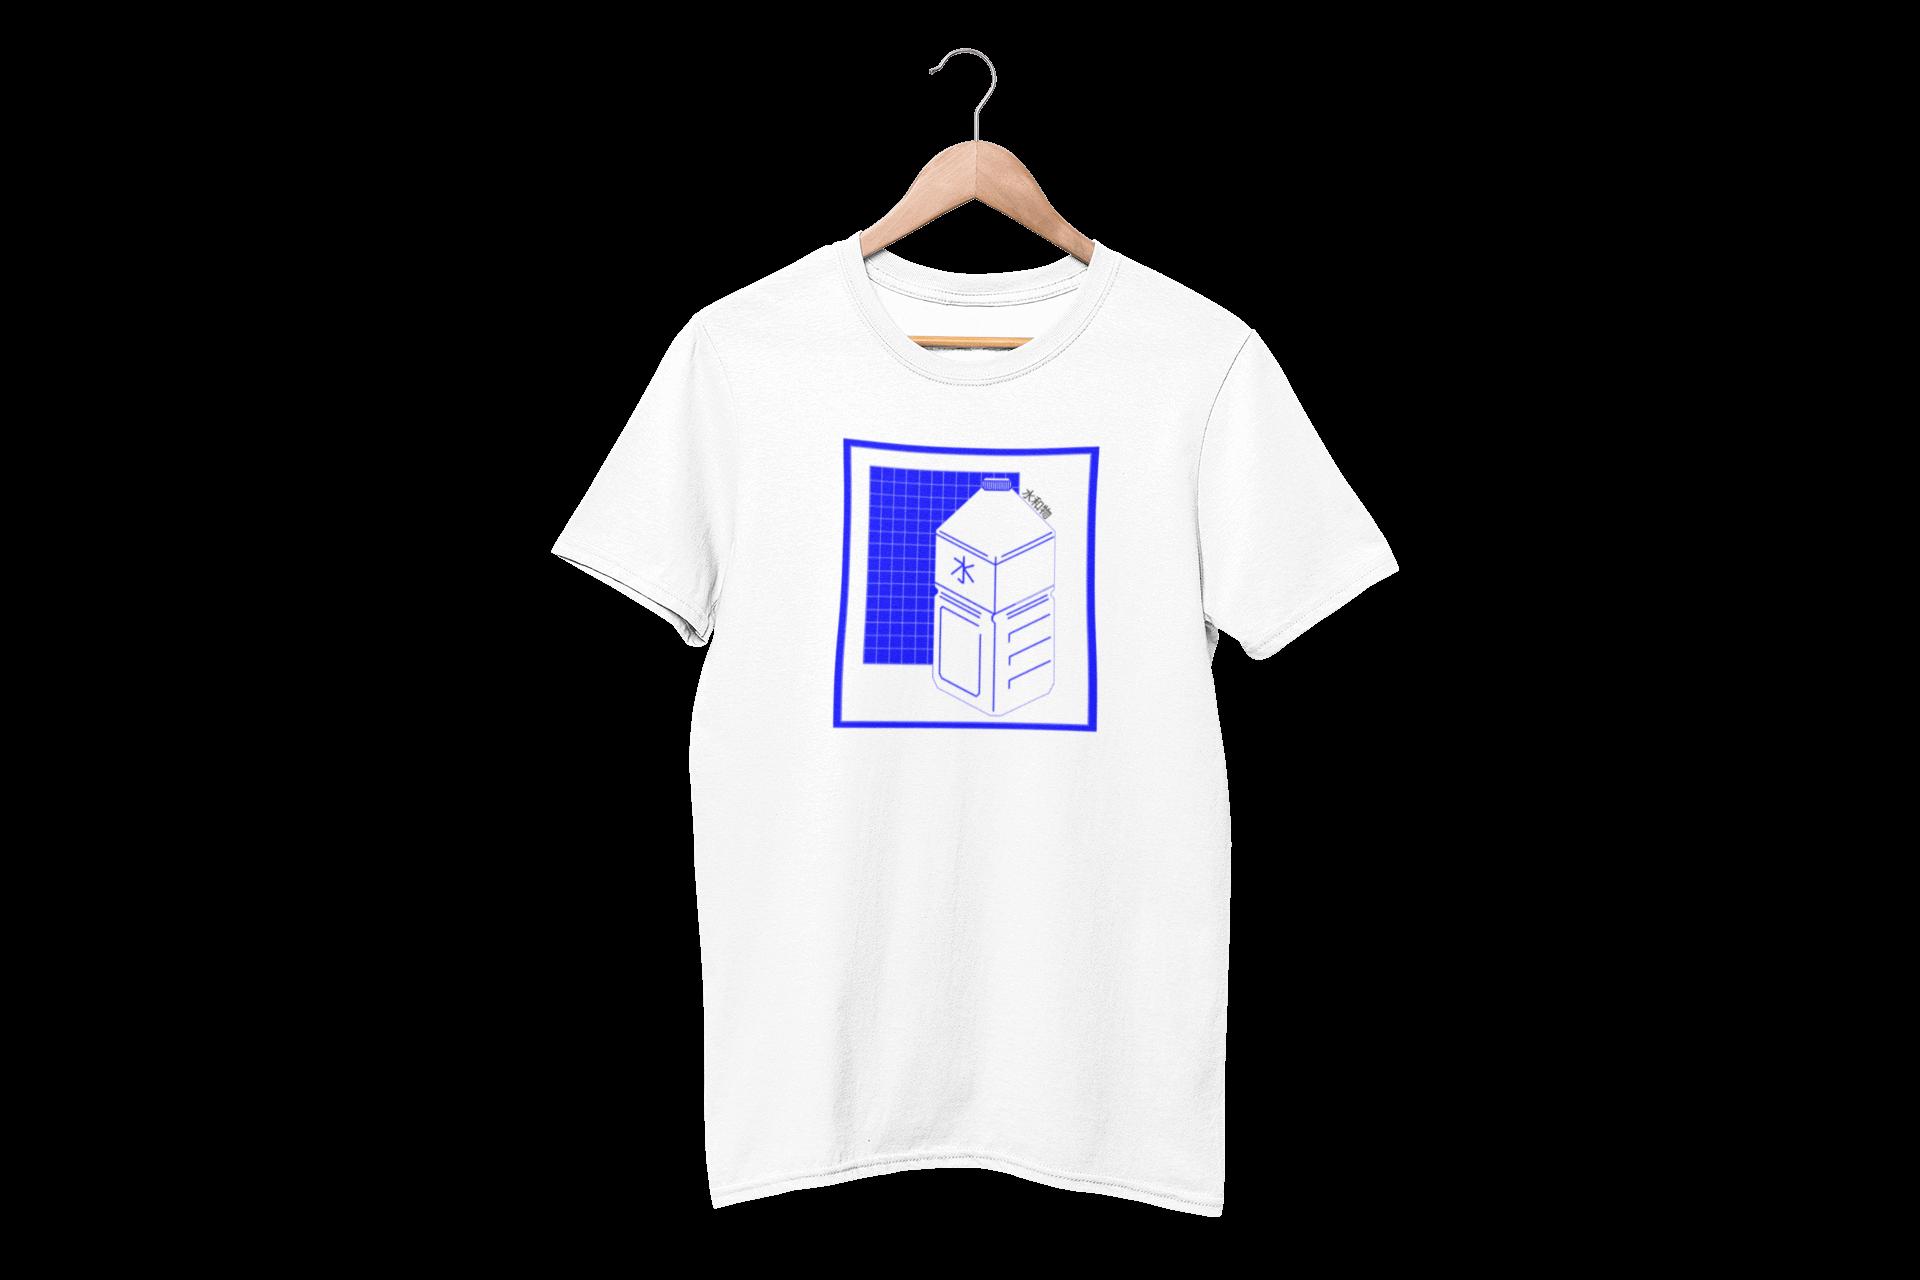 Hydrate White Half Sleeve T-Shirt